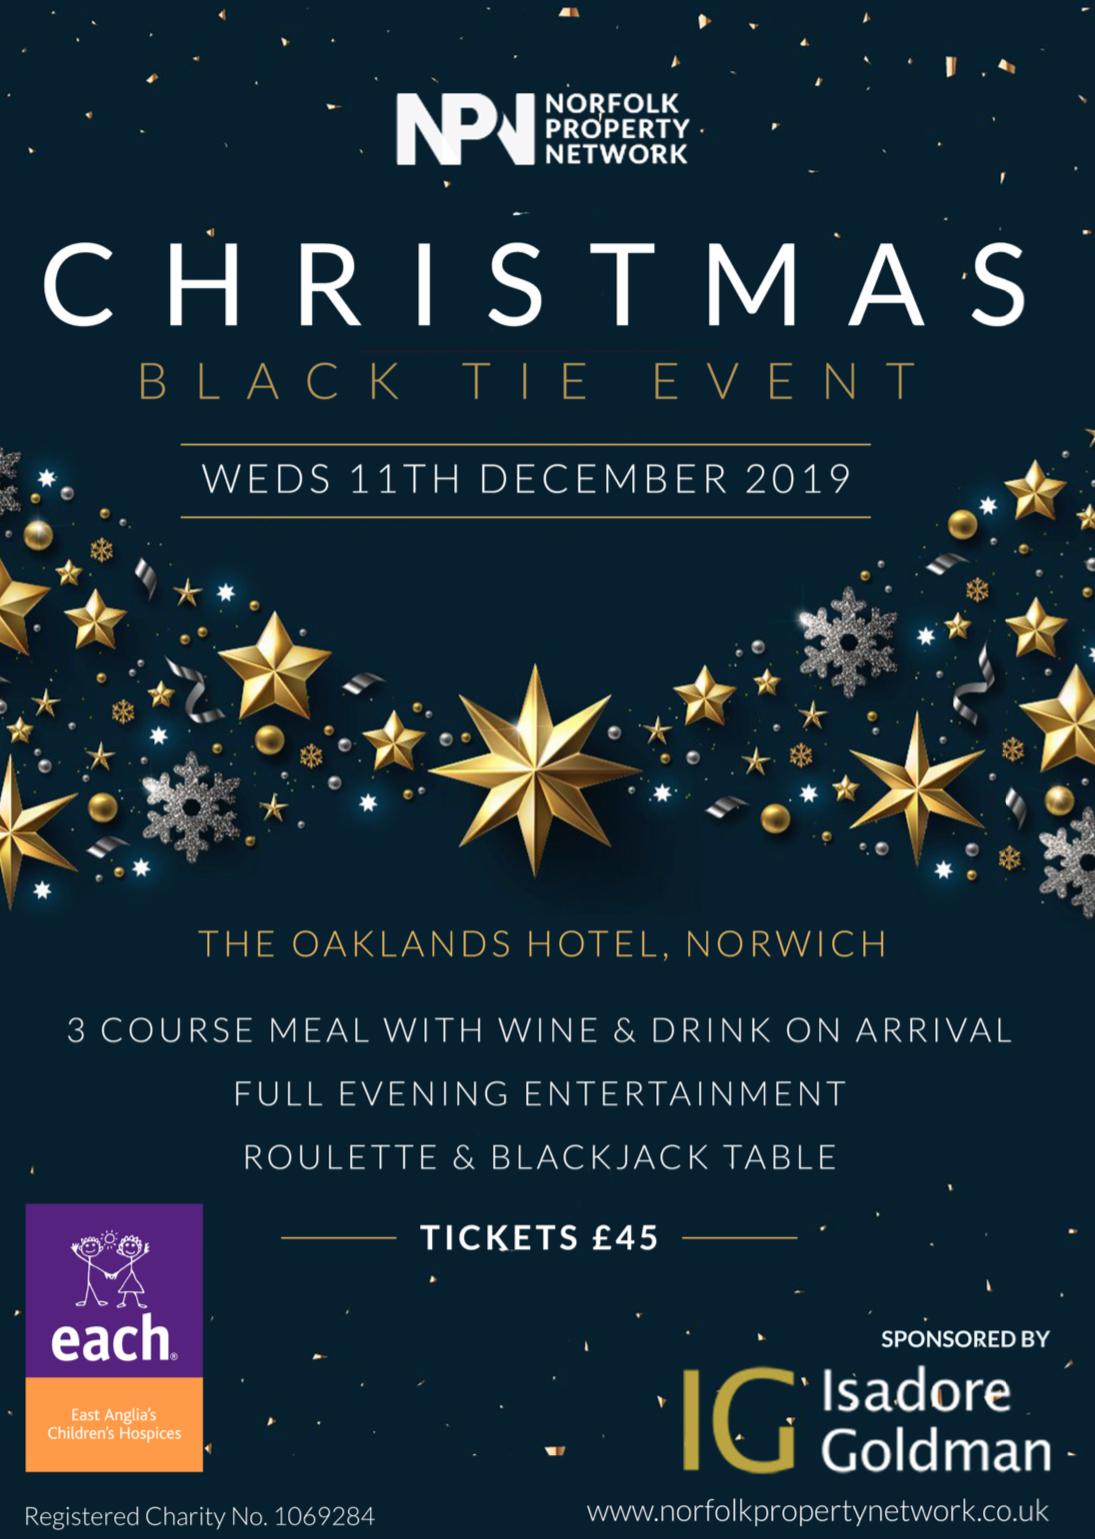 Charity Black Tie Christmas NPN Wednesday 11th December